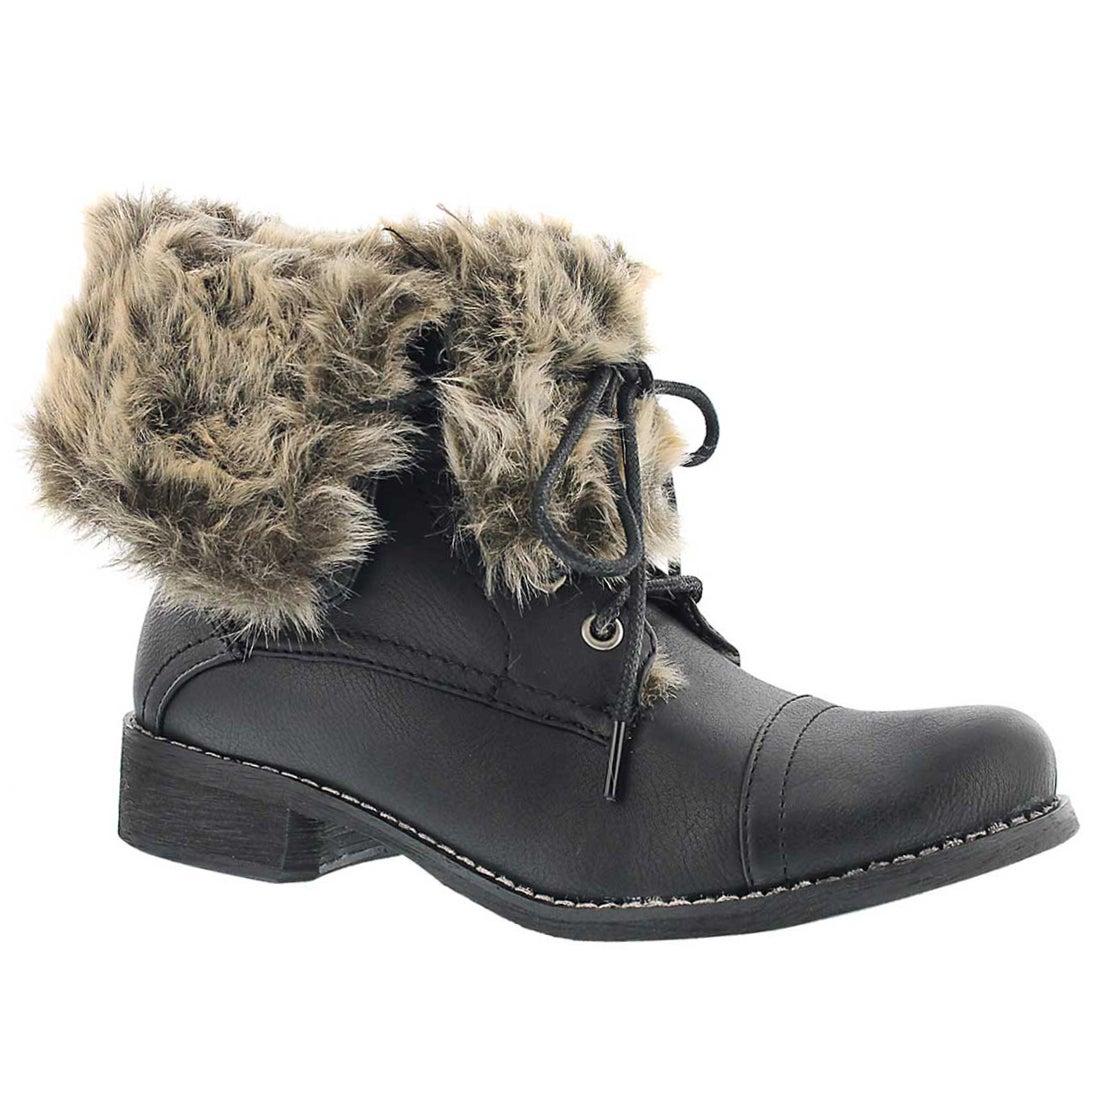 Lds Brandi 2 black lace up combat boot